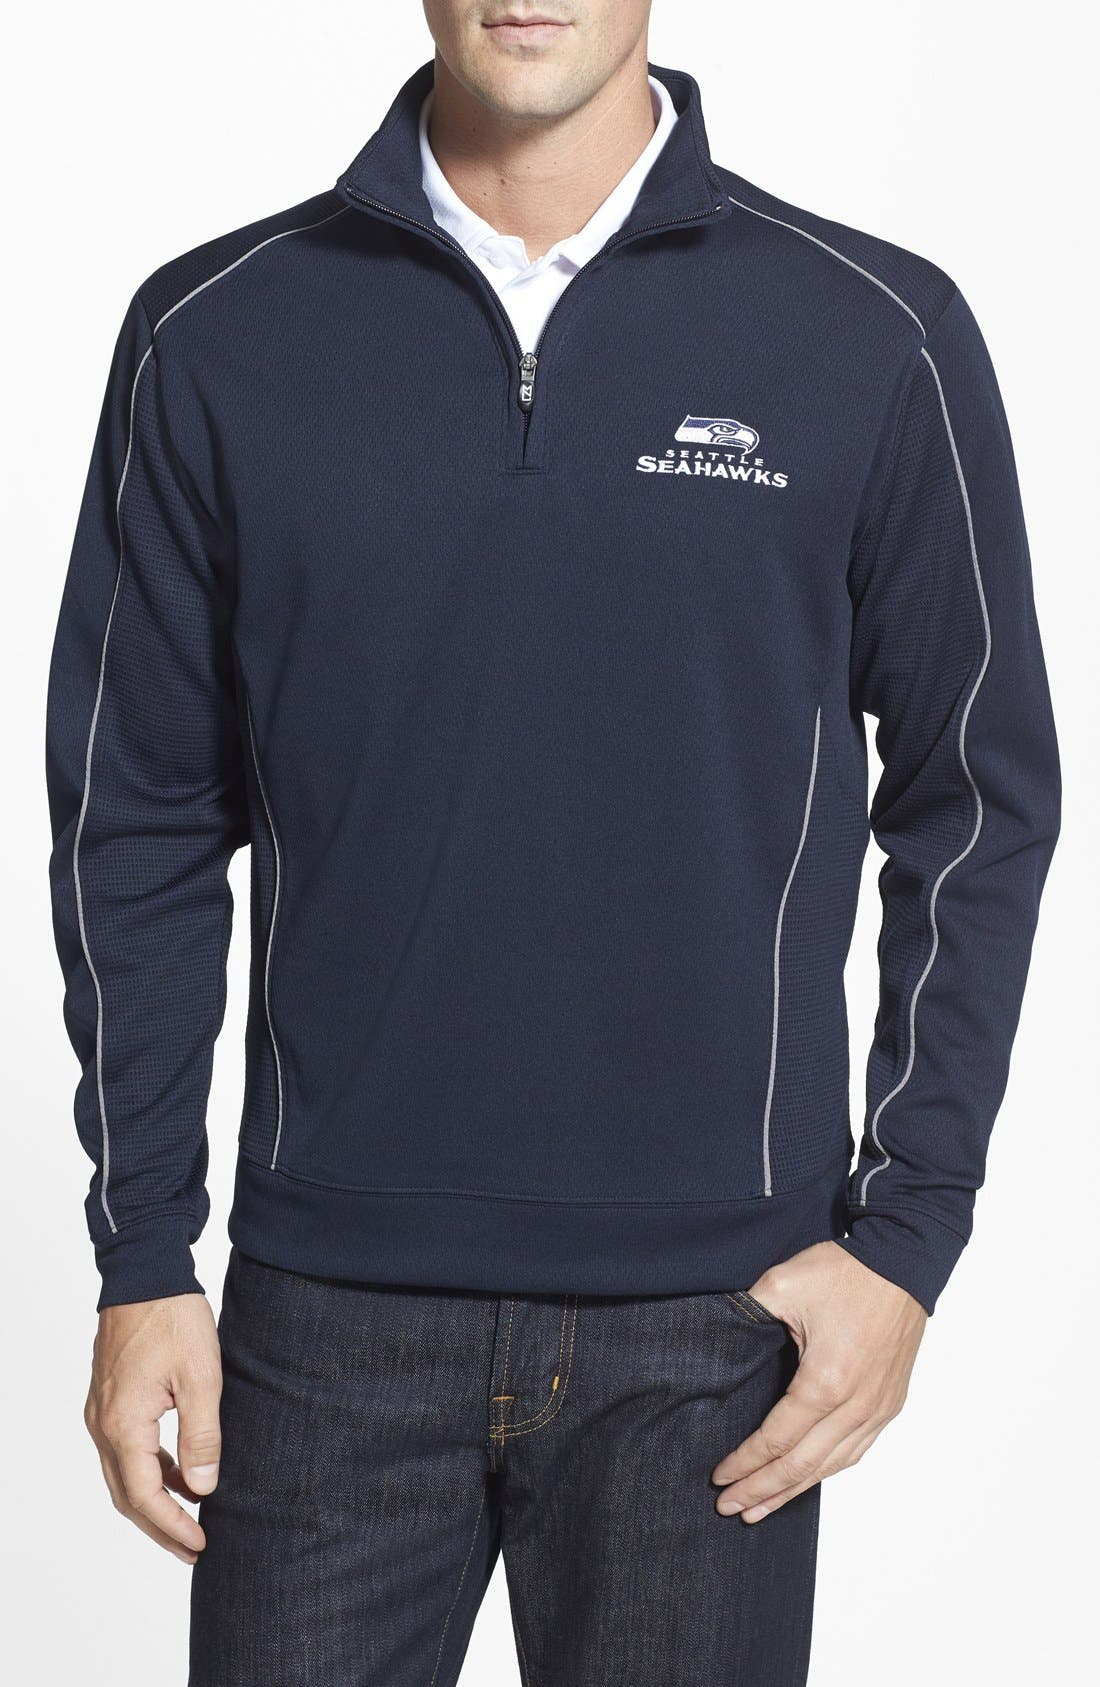 Seattle Seahawks - Edge DryTec Moisture Wicking Half Zip Pullover,                             Main thumbnail 1, color,